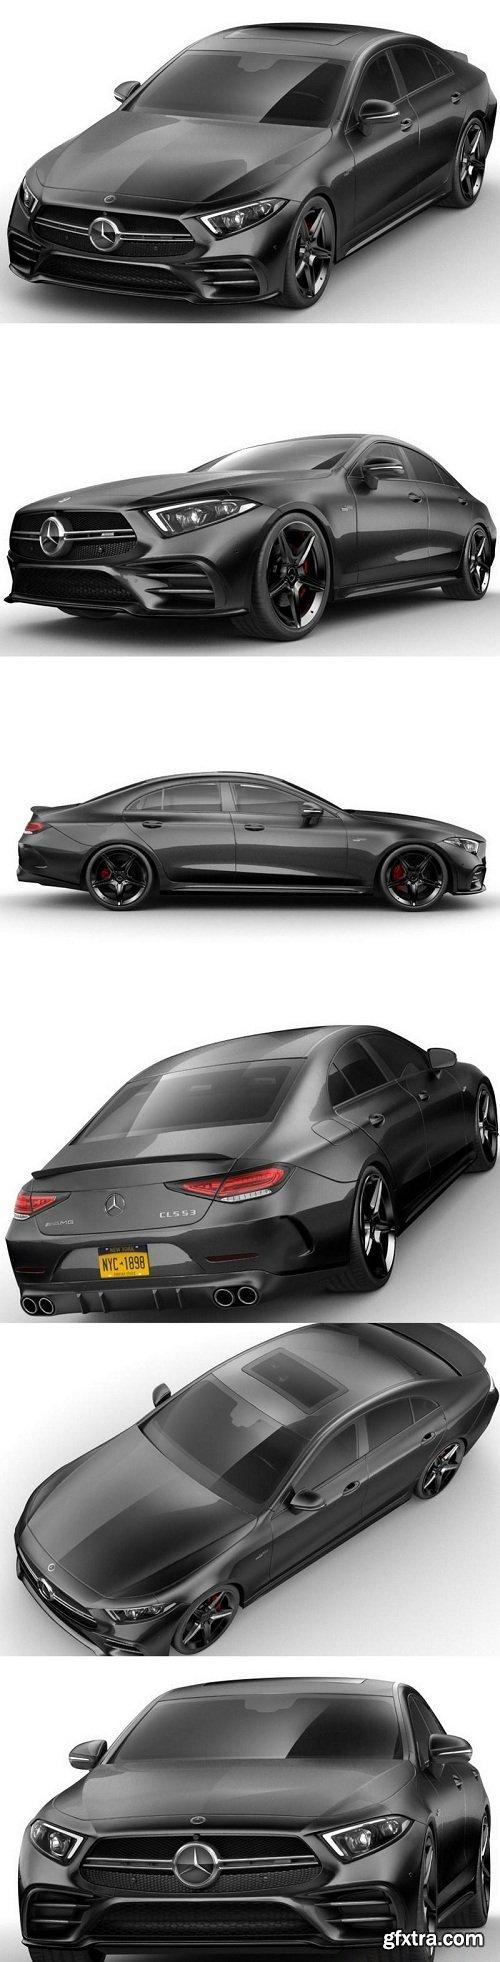 Mercedes CLS AMG 2019 Edition 3D Model